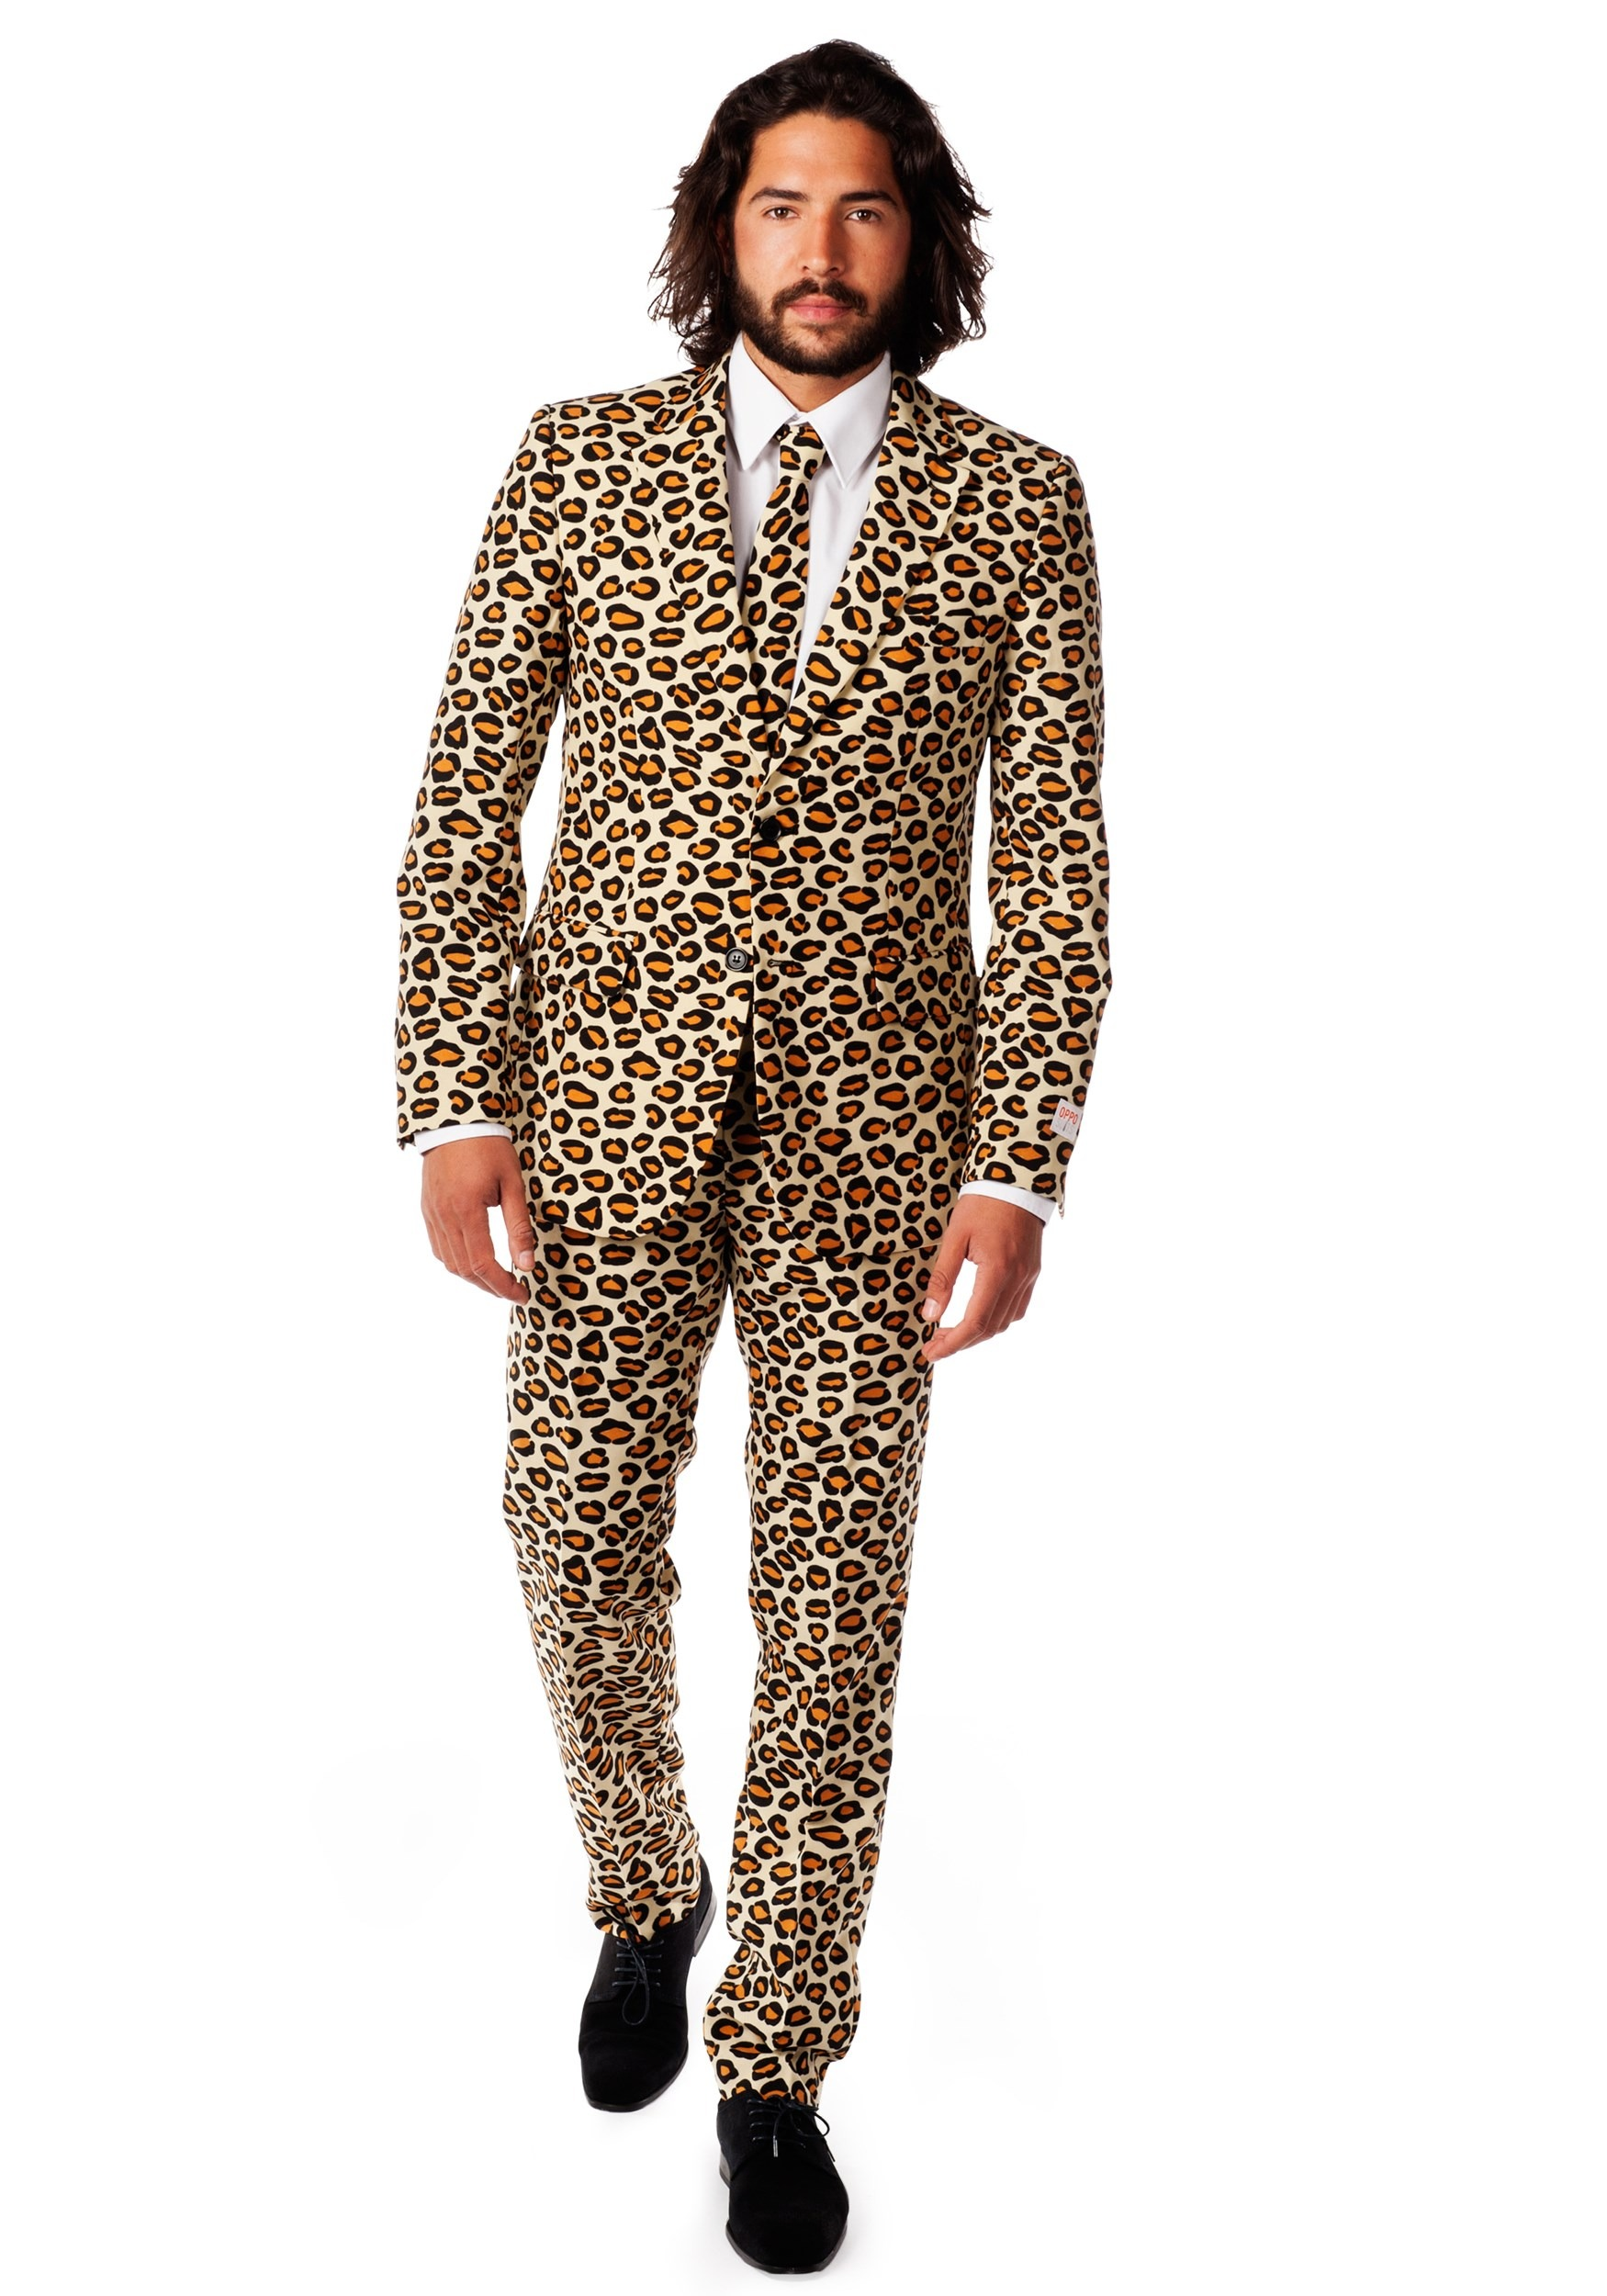 Men's Jaguar Print Suit OppoSuits Costume